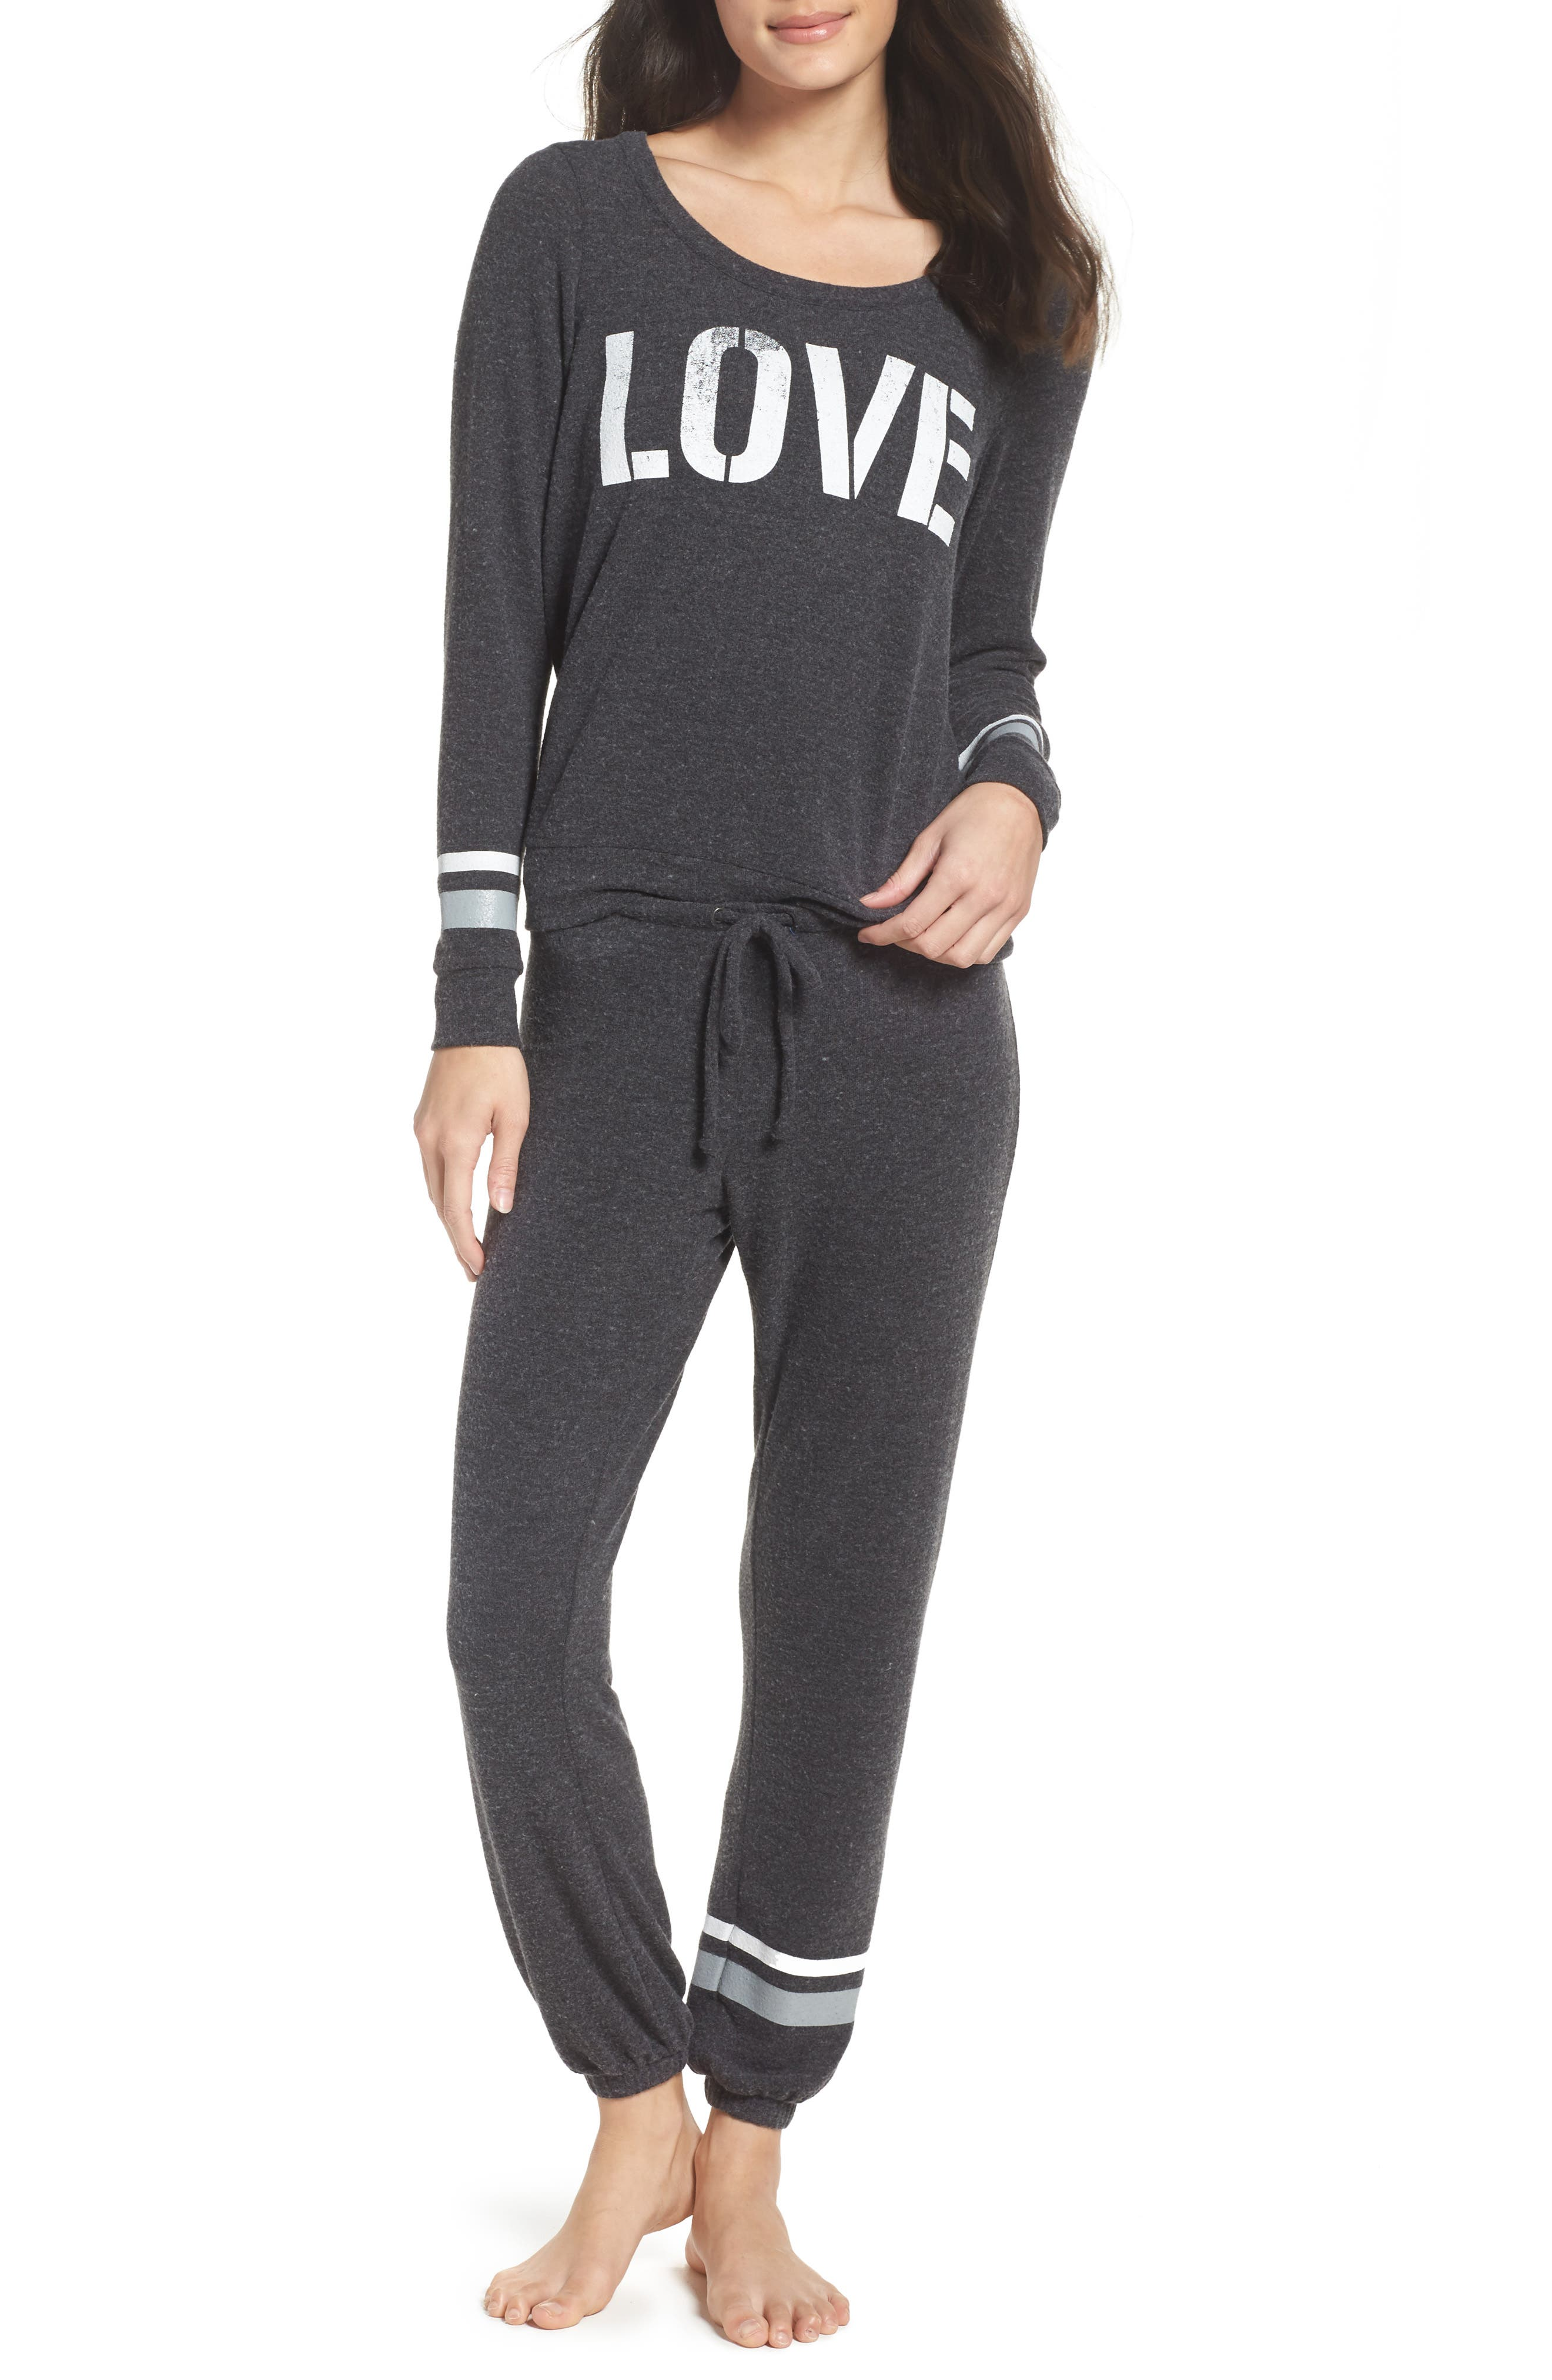 Love Lounge Jogger Pants,                             Alternate thumbnail 5, color,                             Black